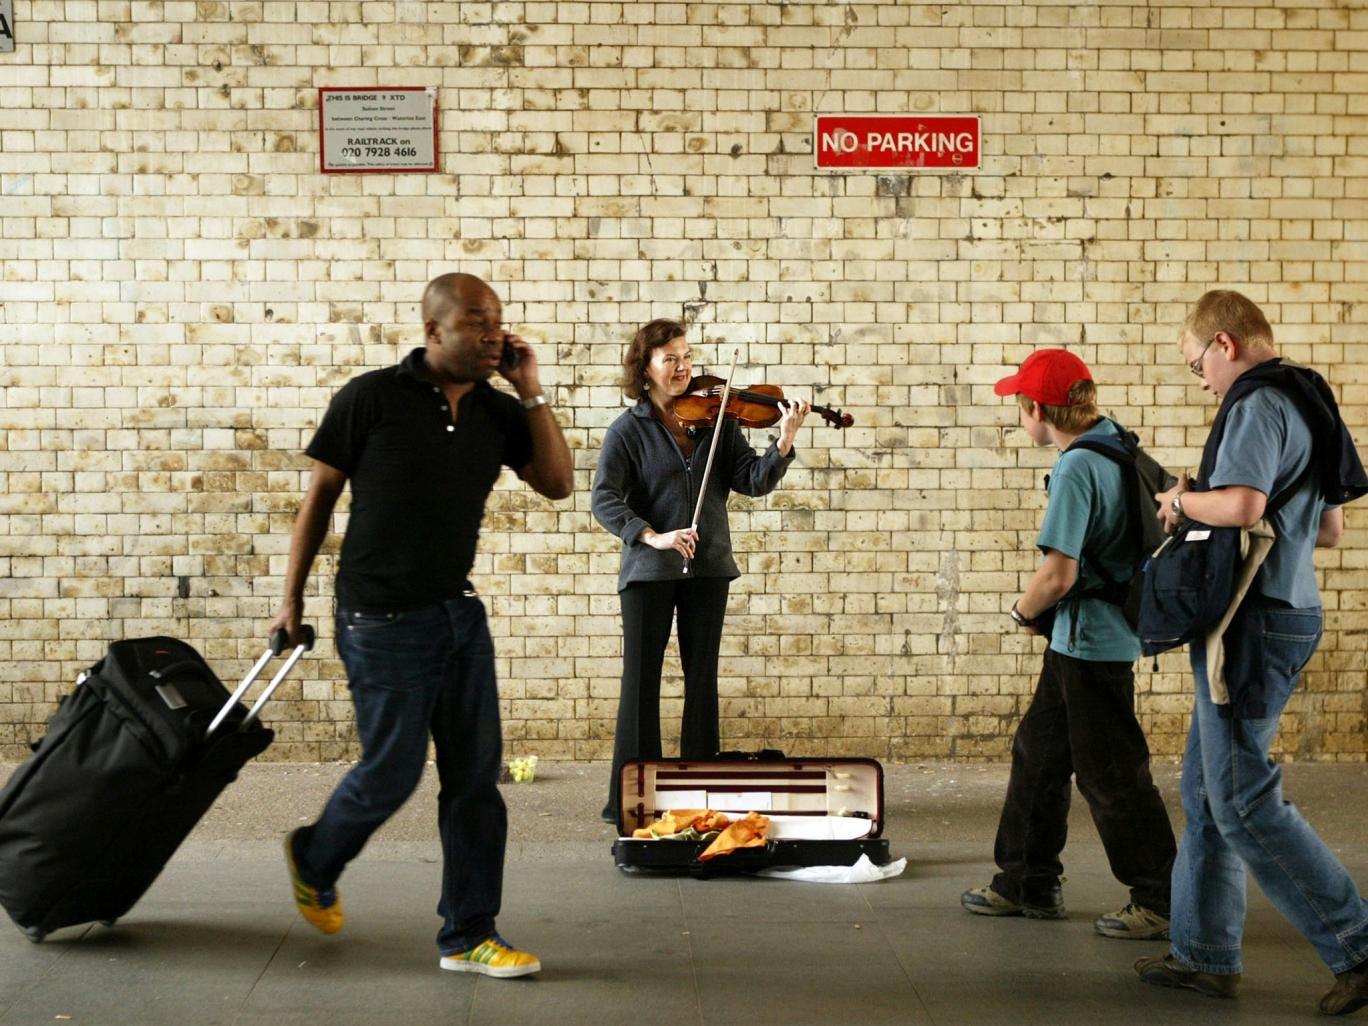 Off the wall: Tasmin Little busking at Waterloo station